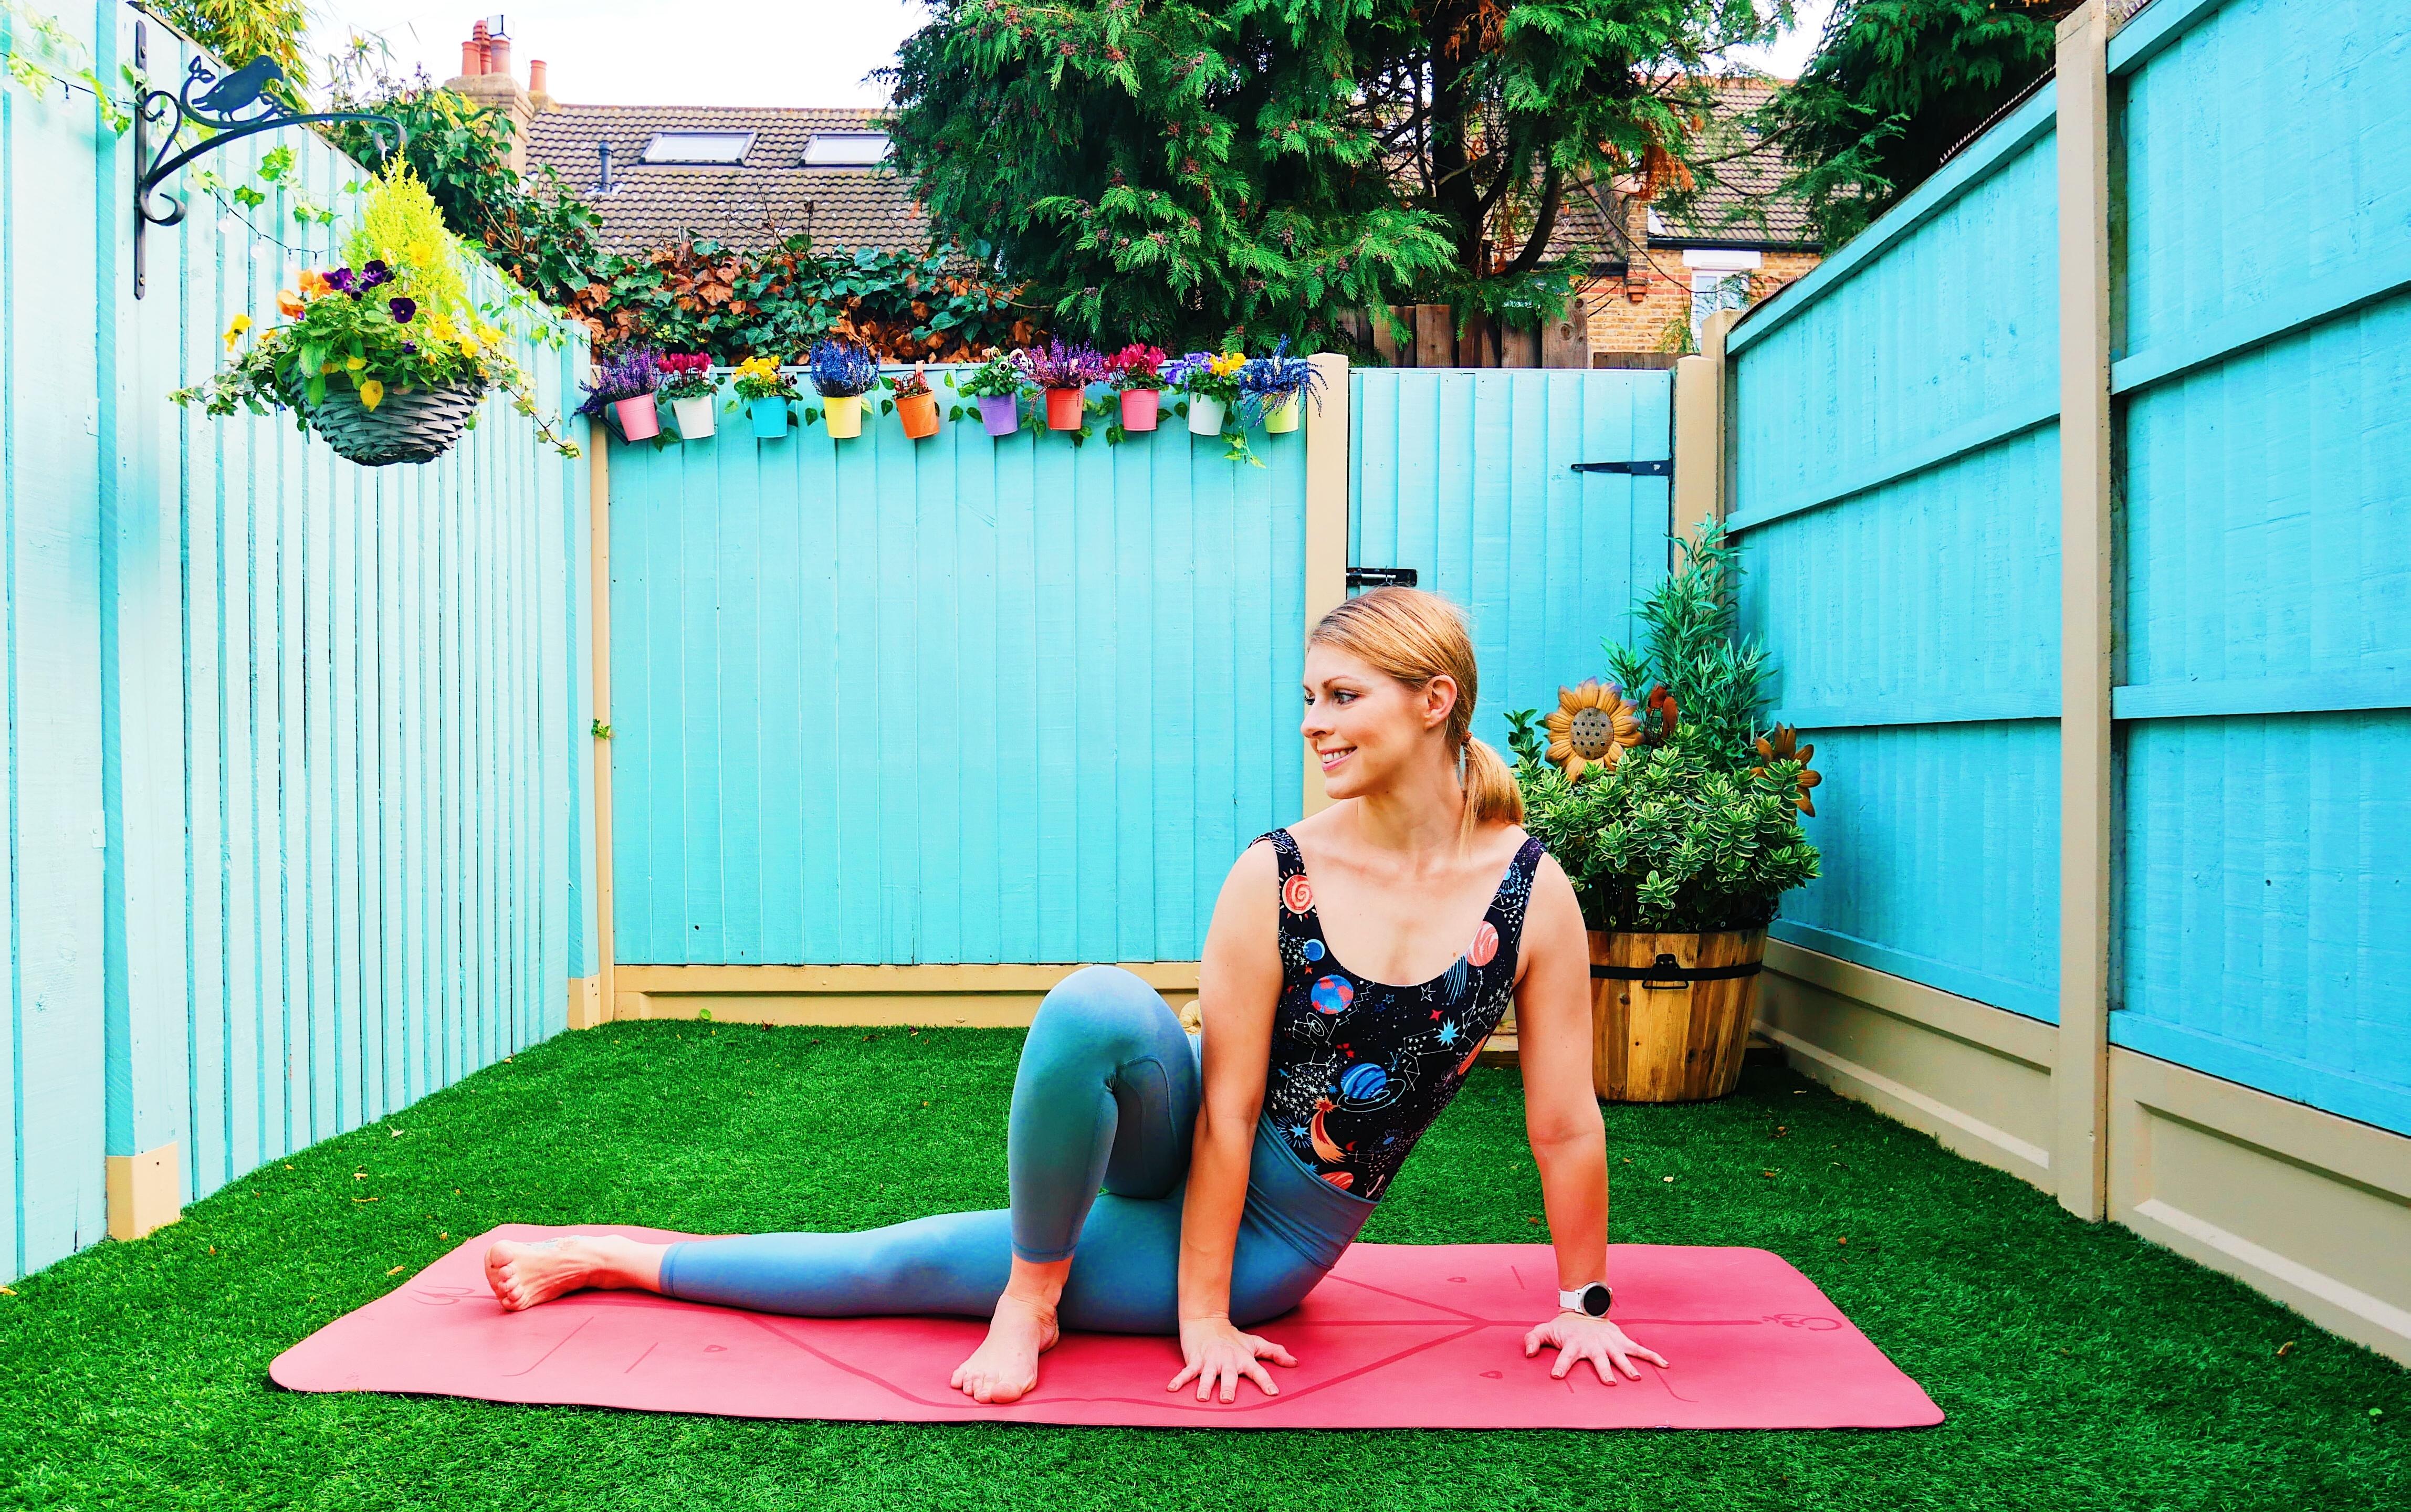 Yoga baby grasshopper arm balance how to tutorial